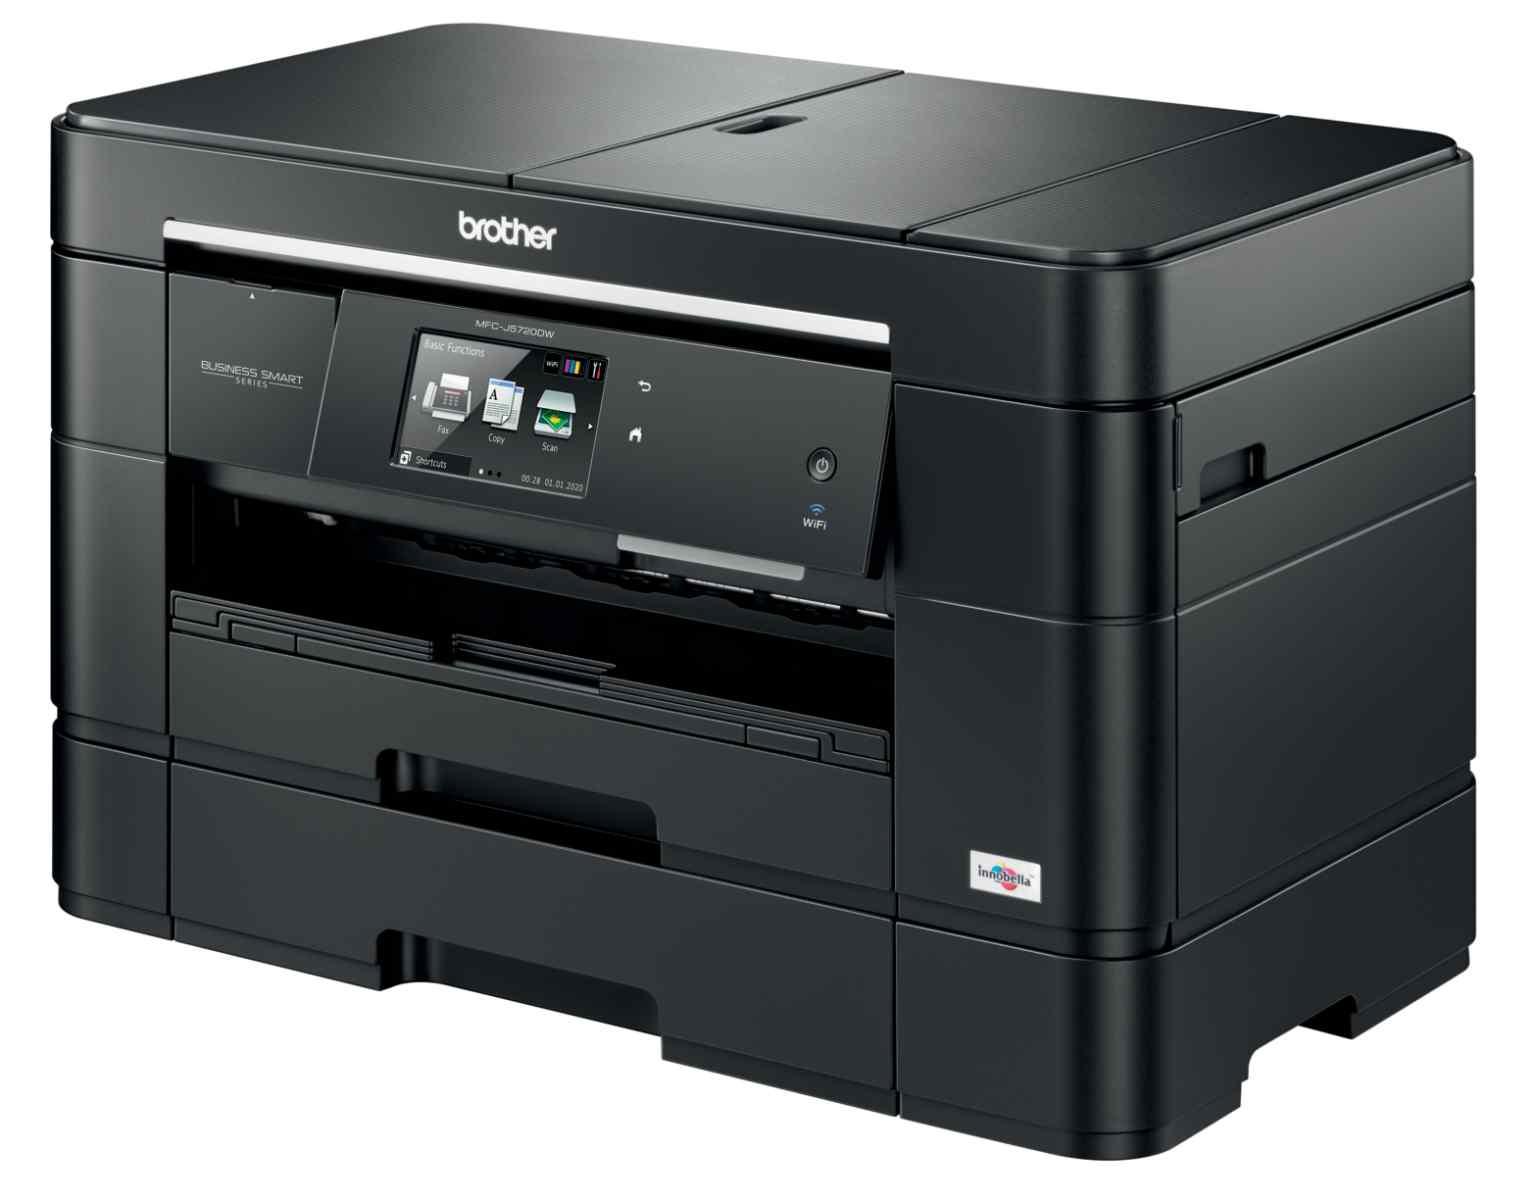 BROTHER multifunkce inkoustová MFC-J5720DWYJ1 - A3, A4 sken DUAL, 35ppm, 128MB 1200x6000 USB LAN WiFi dup 50ADF 2x250lis